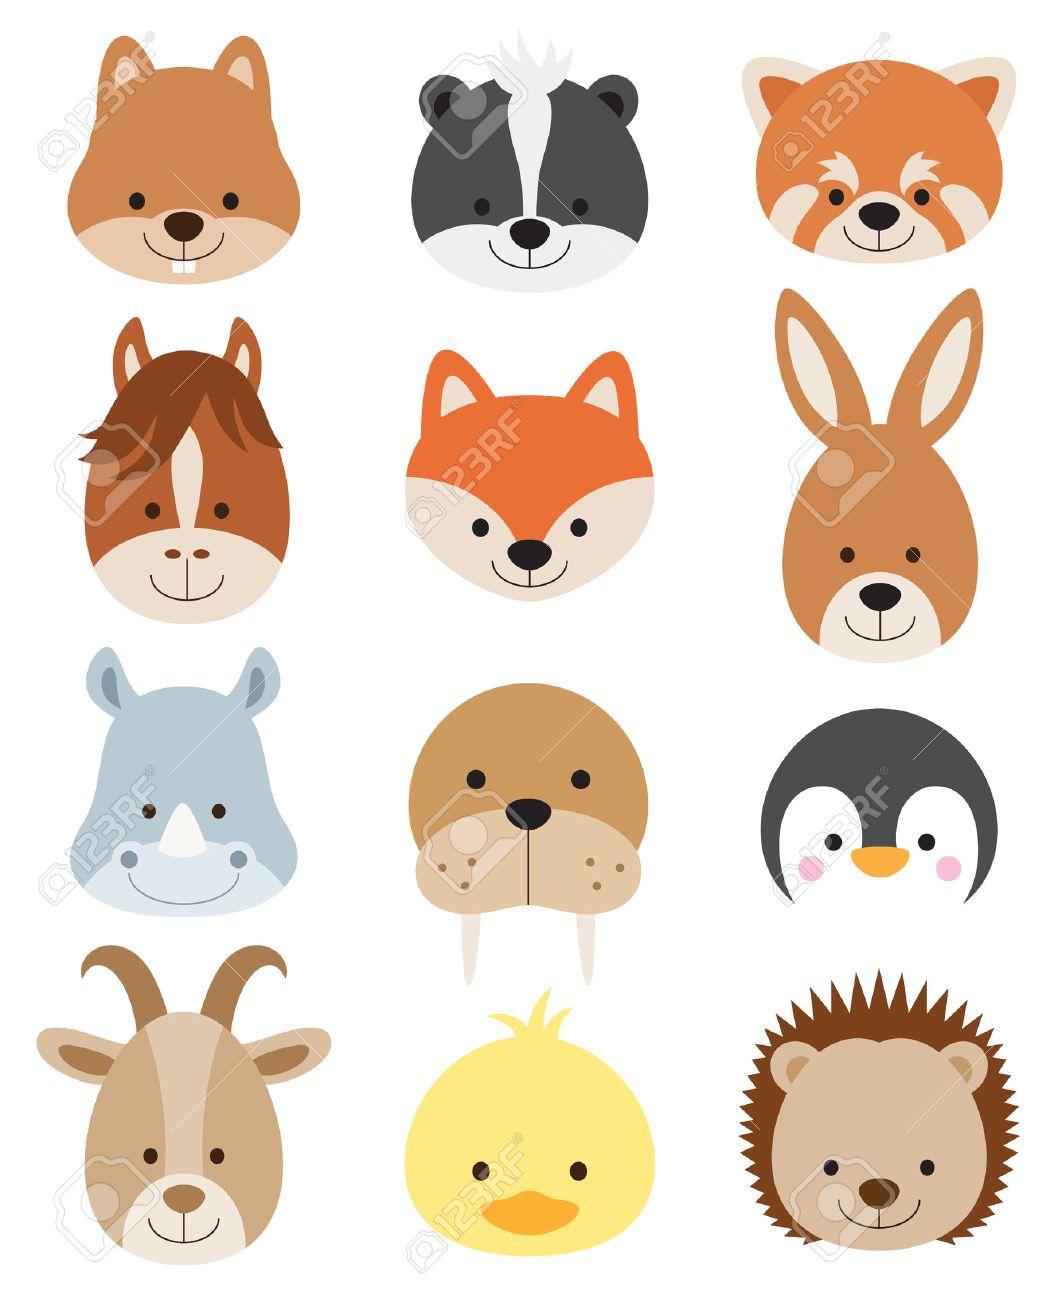 Vector illustration of animal faces including squirrel, hamster, skunk, red panda, horse, fox, kangaroo, rhino, walrus, penguin, goat, duck, and hedgehog. Stock Vector - 47809073